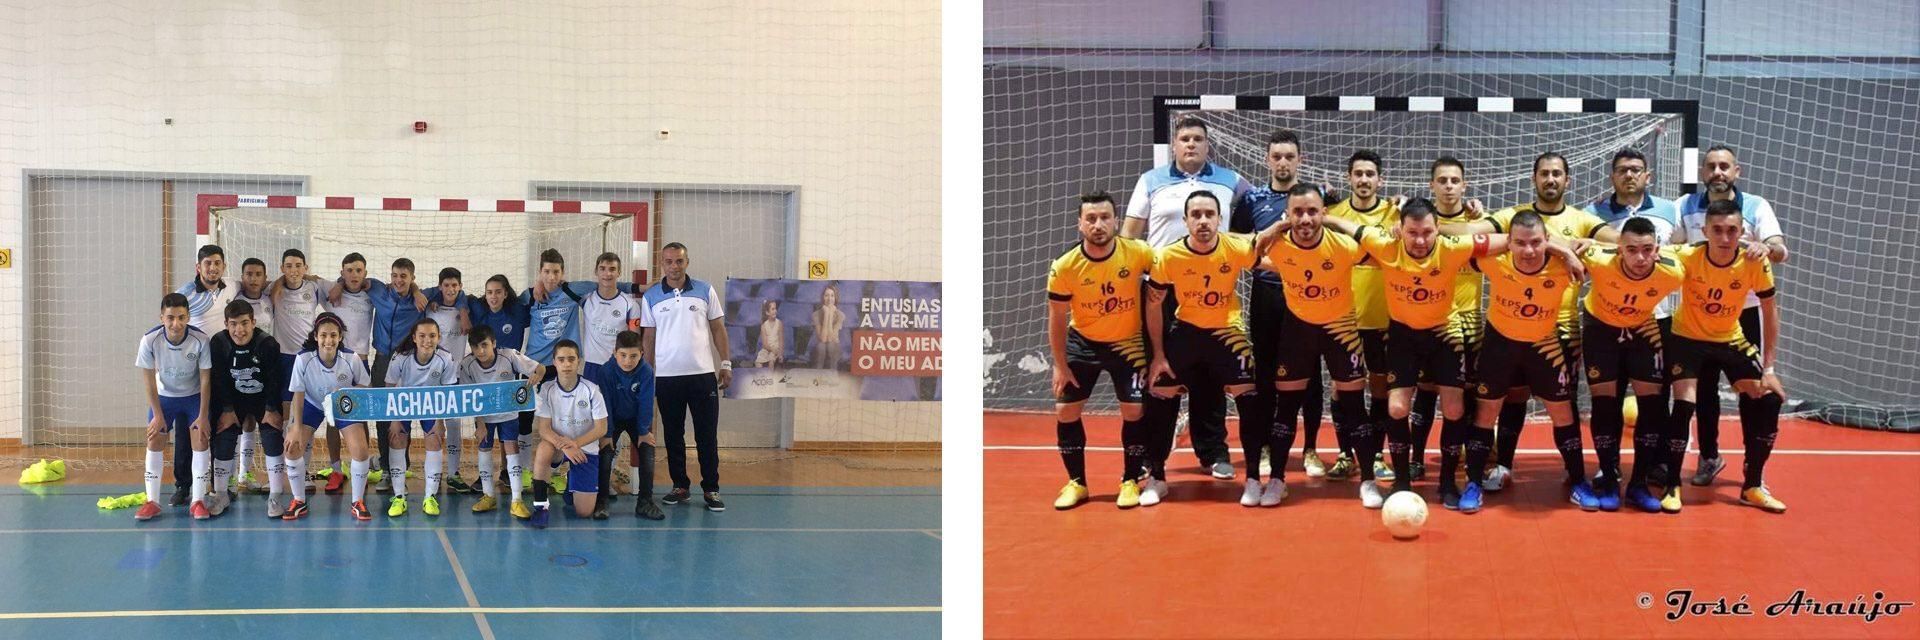 Achada Futebol Clube